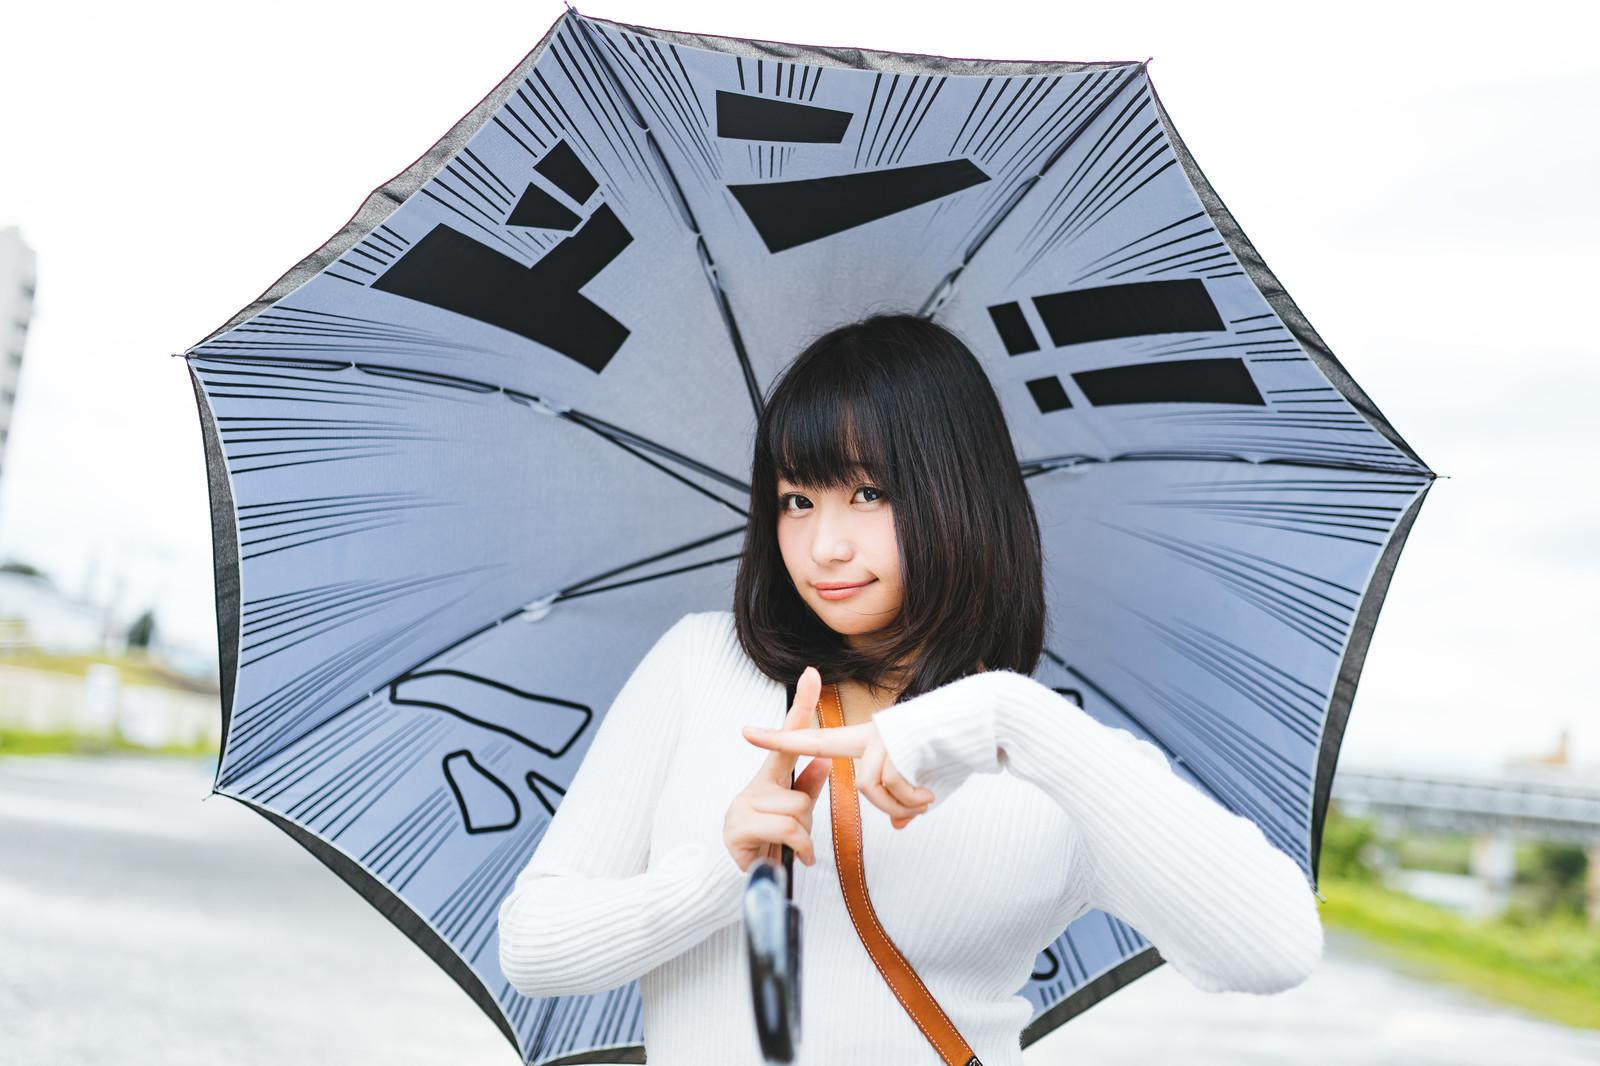 東京都世田谷区にて東日本大震災地震保険申請のご報告